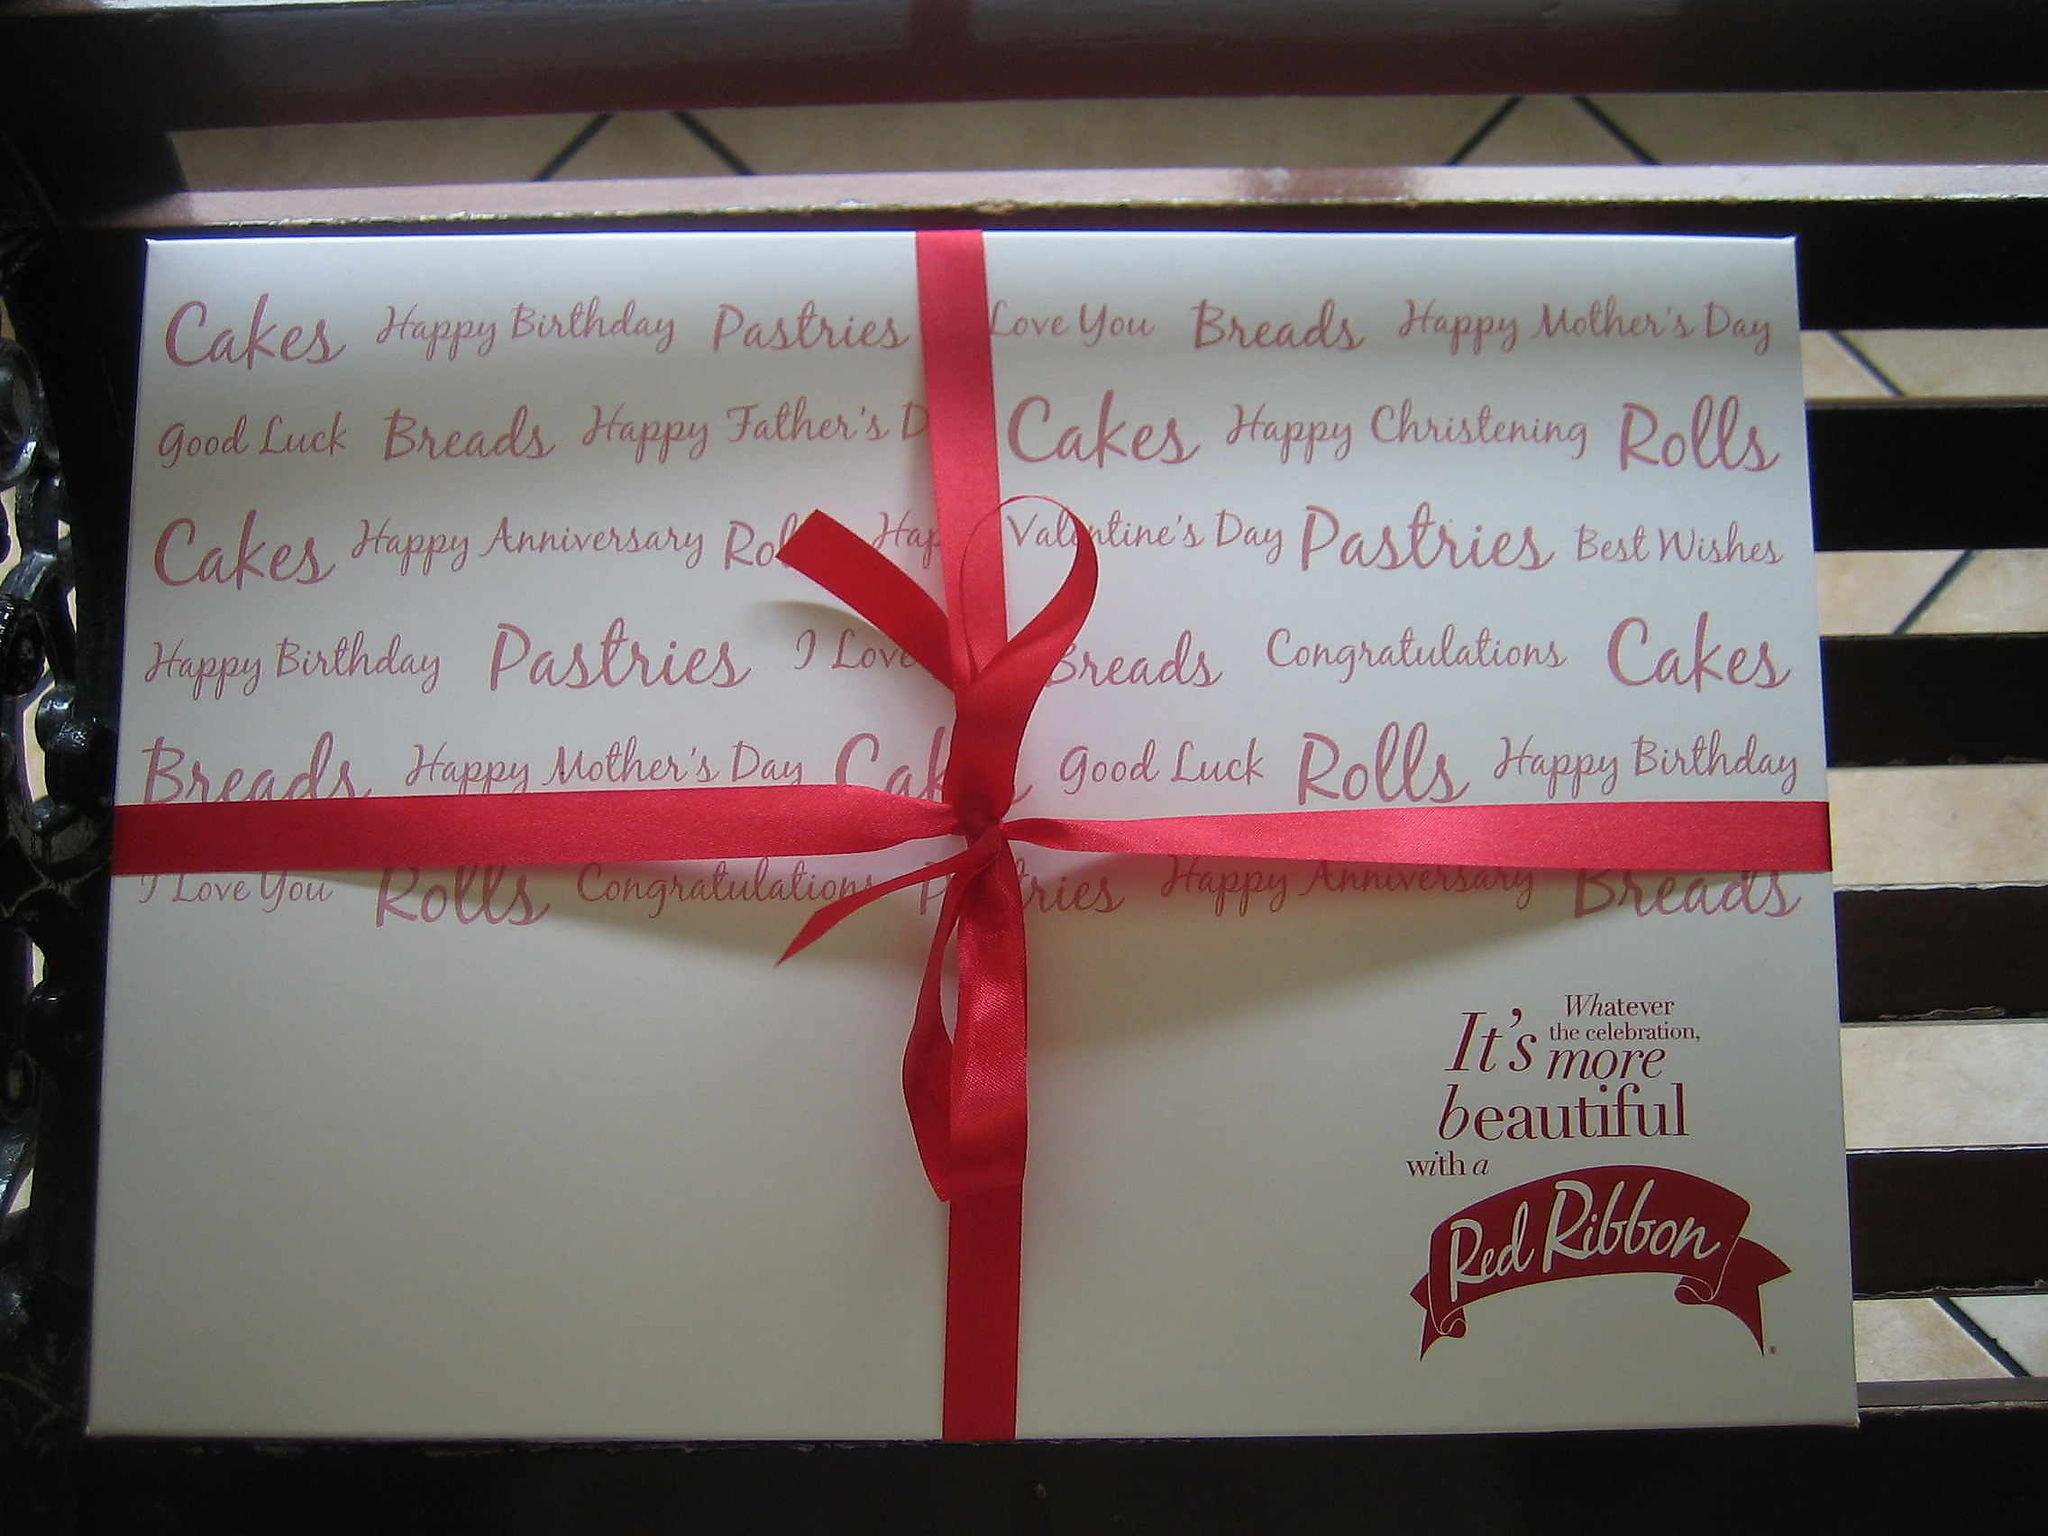 Red Ribbon Cubao Quezon City Metro Manila Cakes Pastries